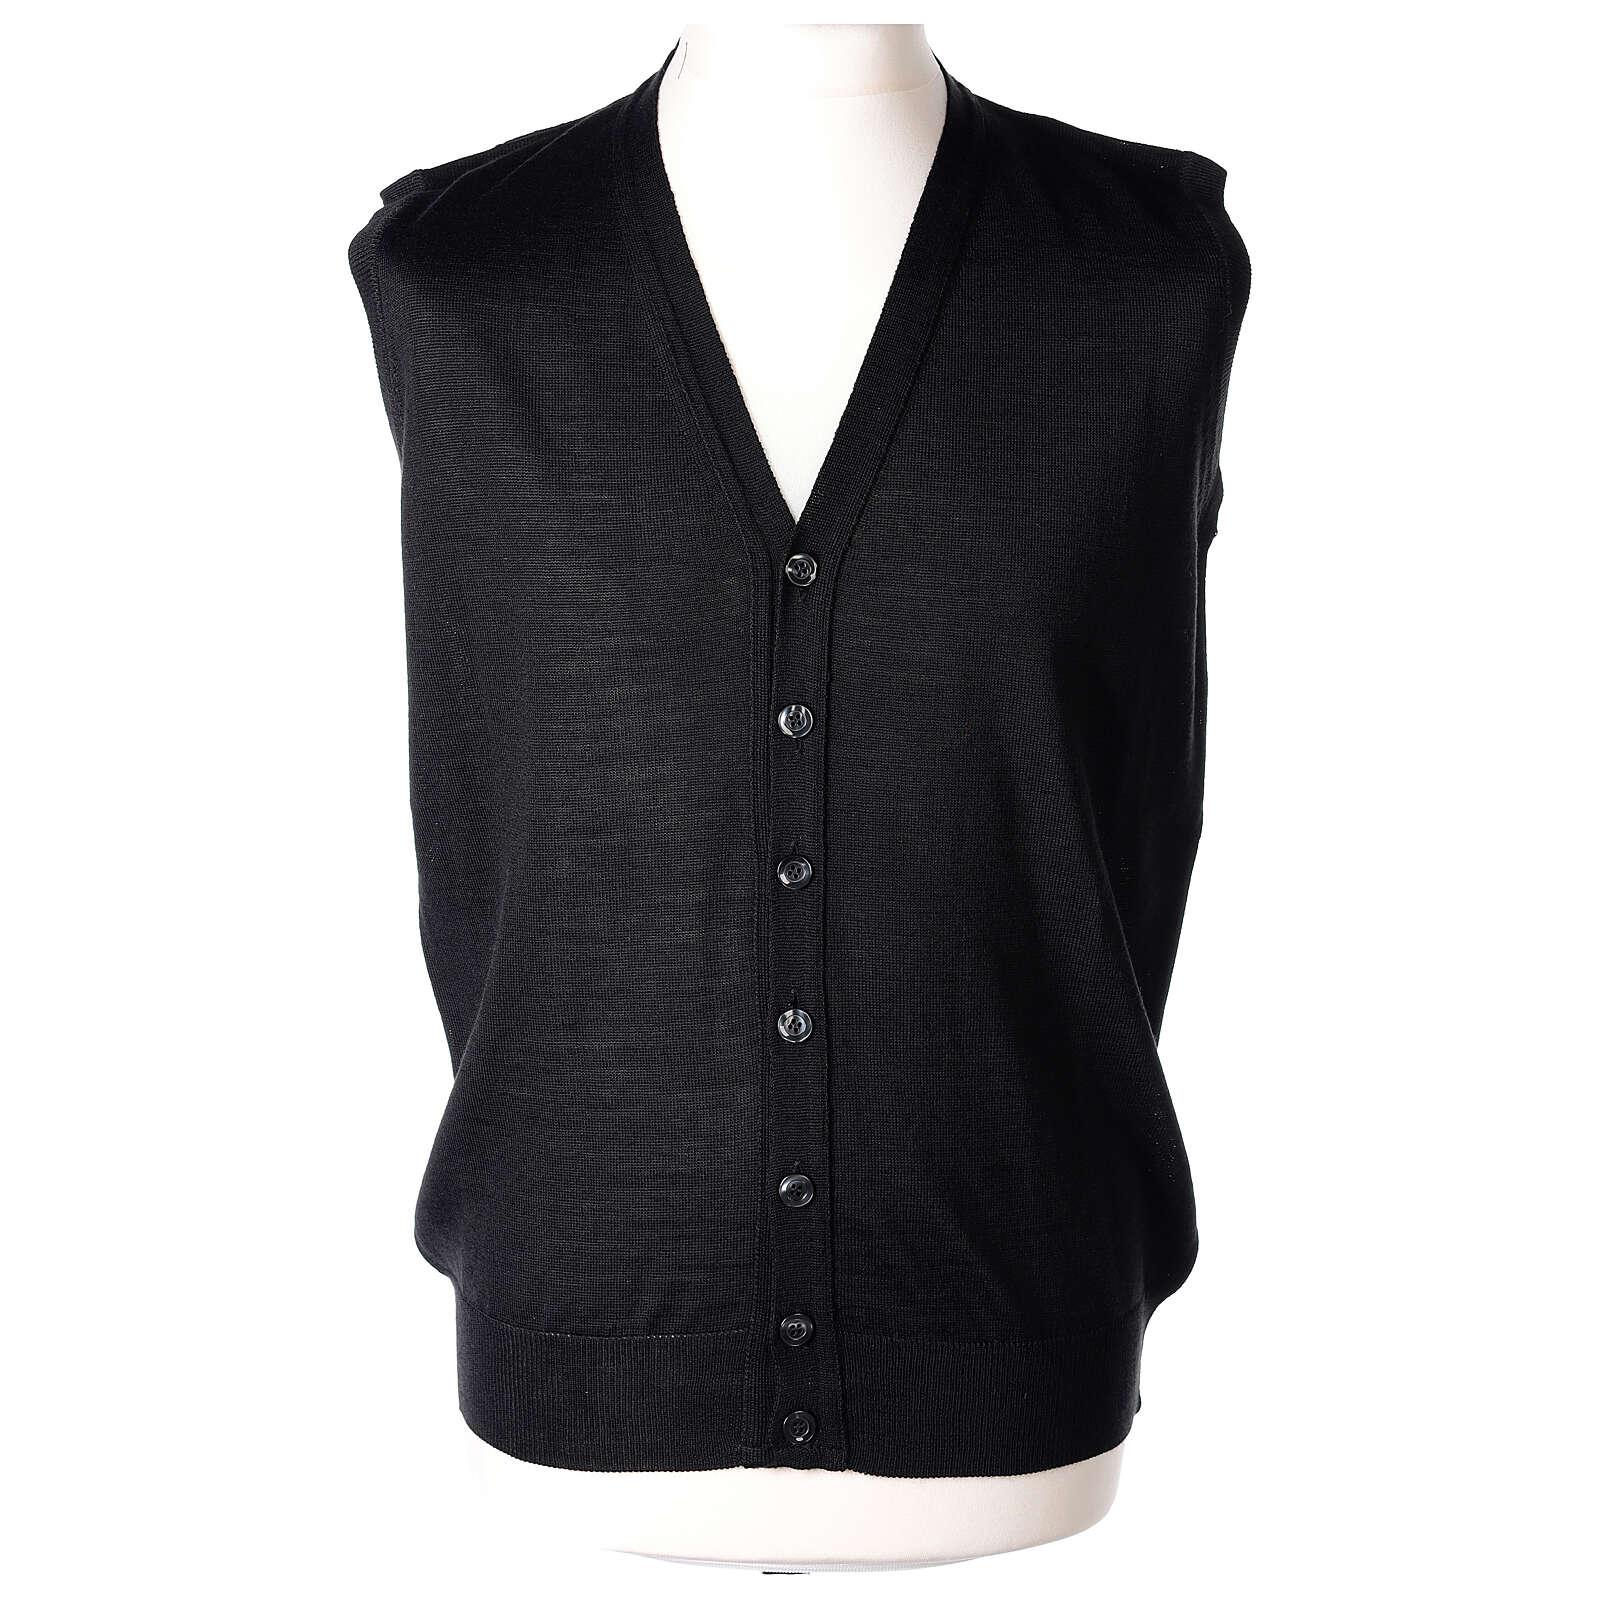 Sleeveless clergy cardigan black plain knit 50% acrylic 50% merino wool In Primis 4